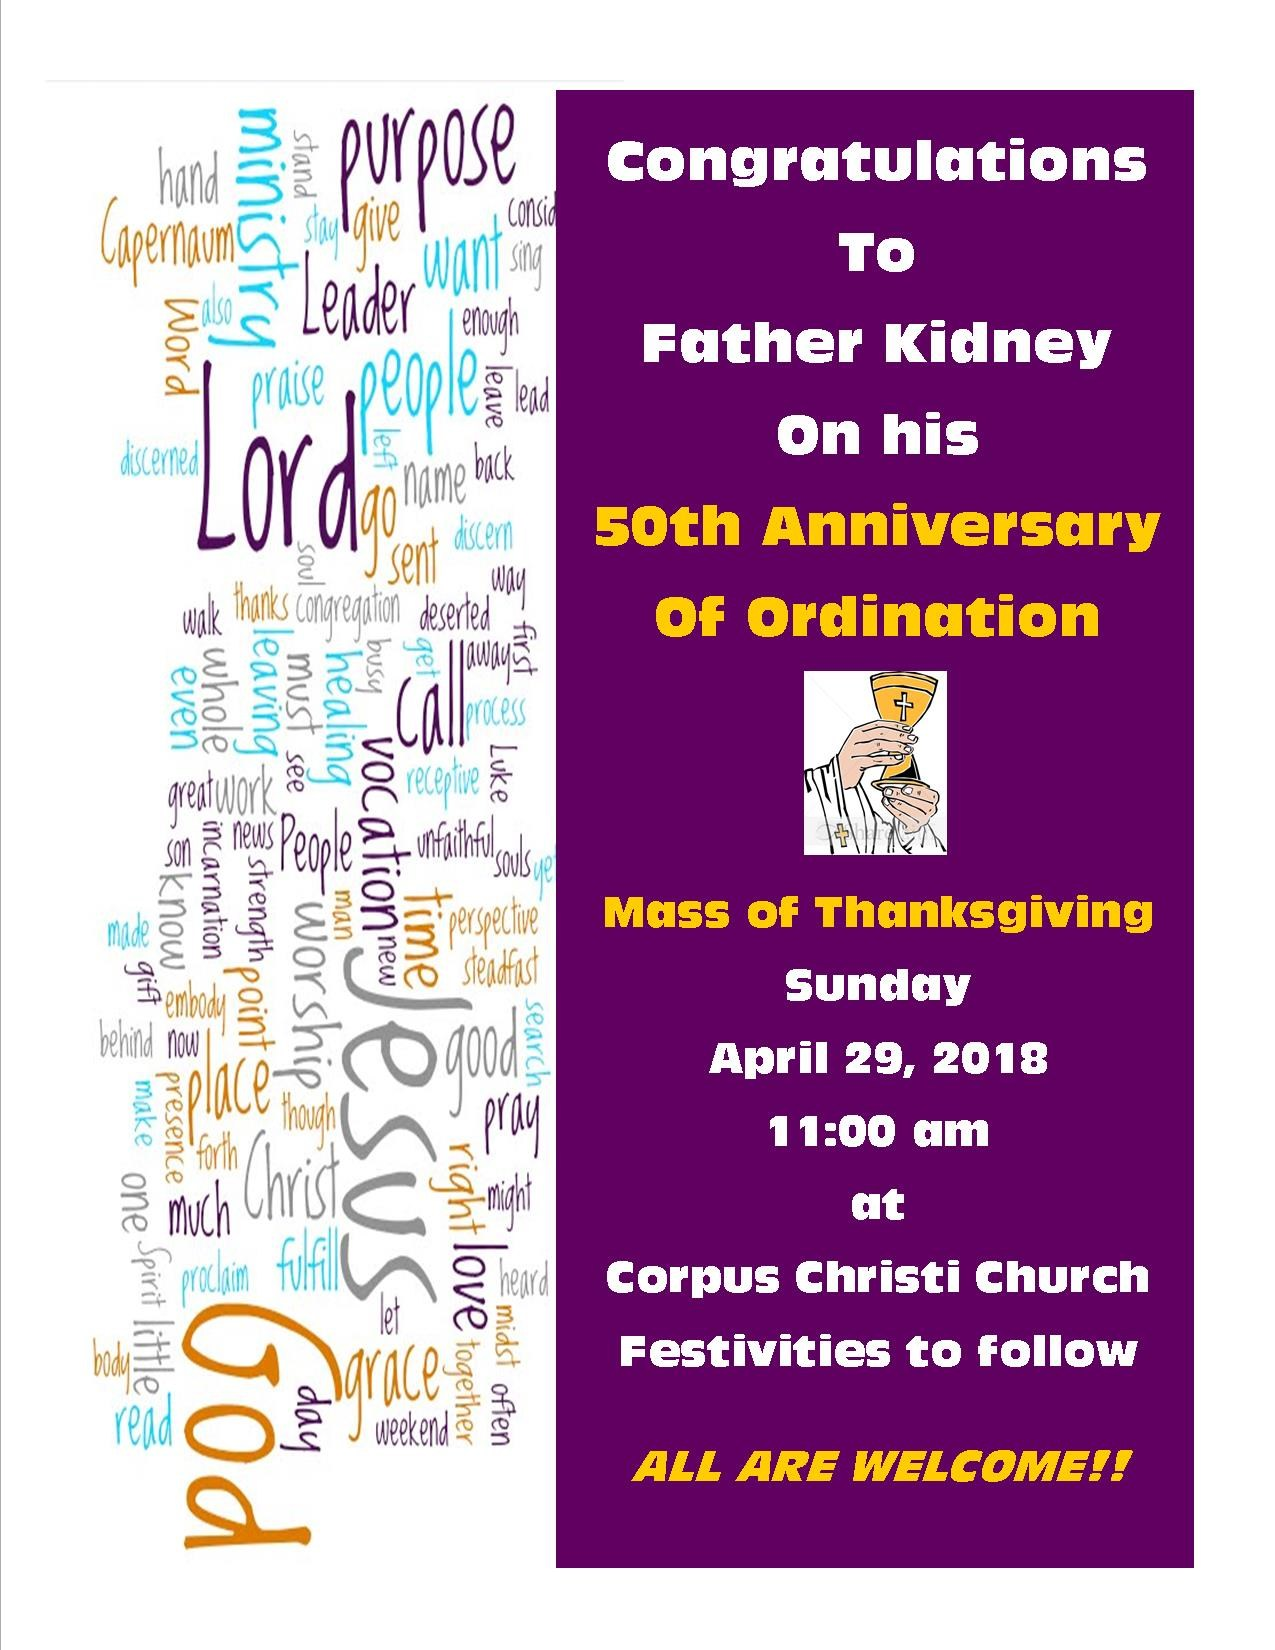 Congratulations Fr. Kidney! Image